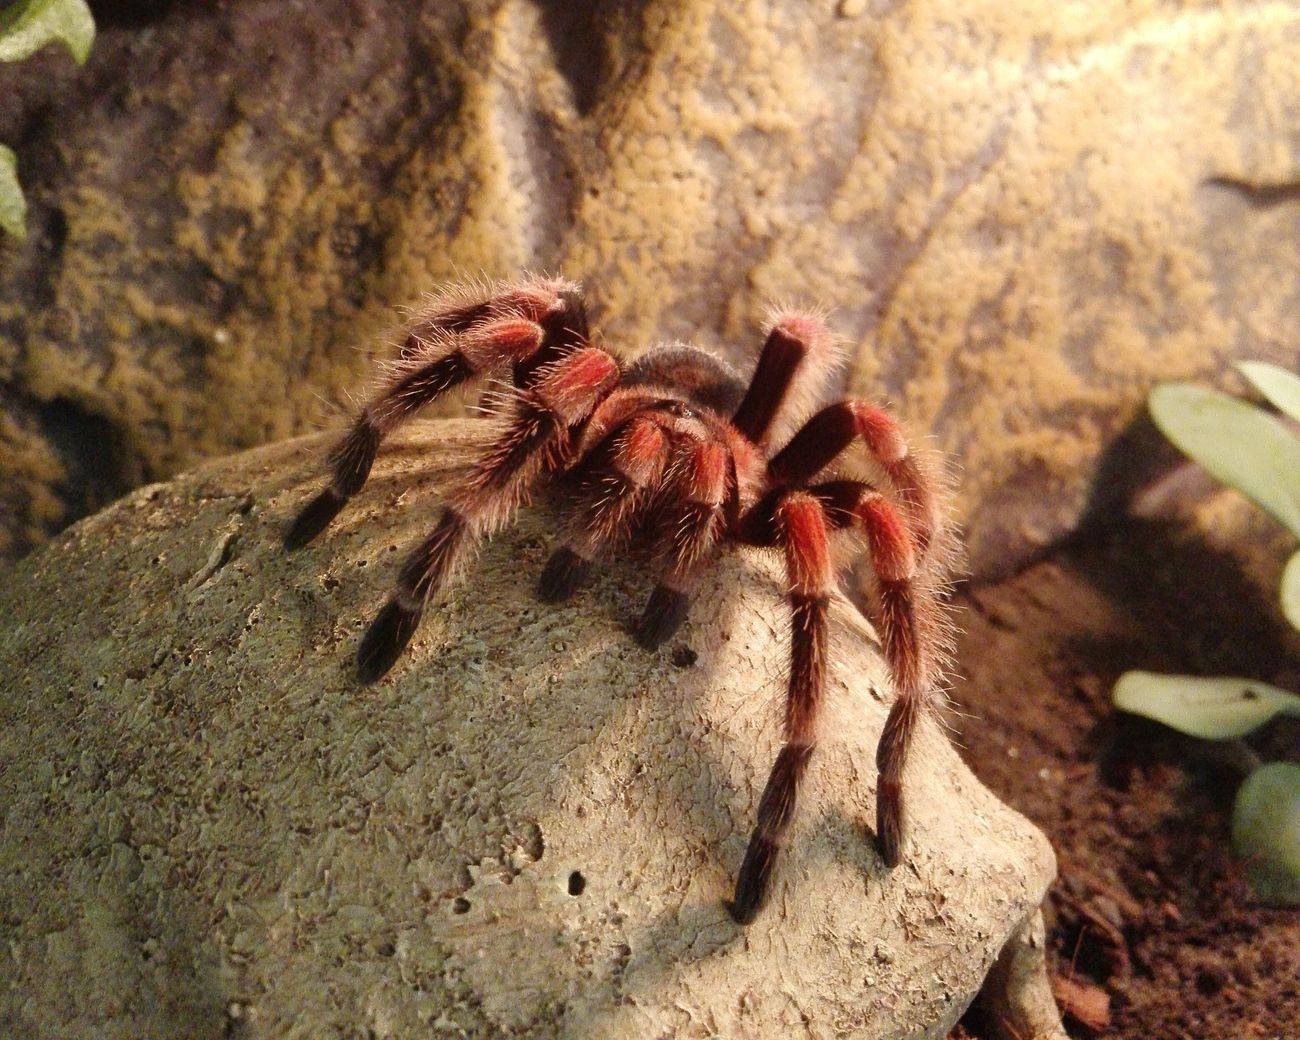 Spinne Marie - Brachypelma Smithi Vogelspinne Brachypelma Tarantula